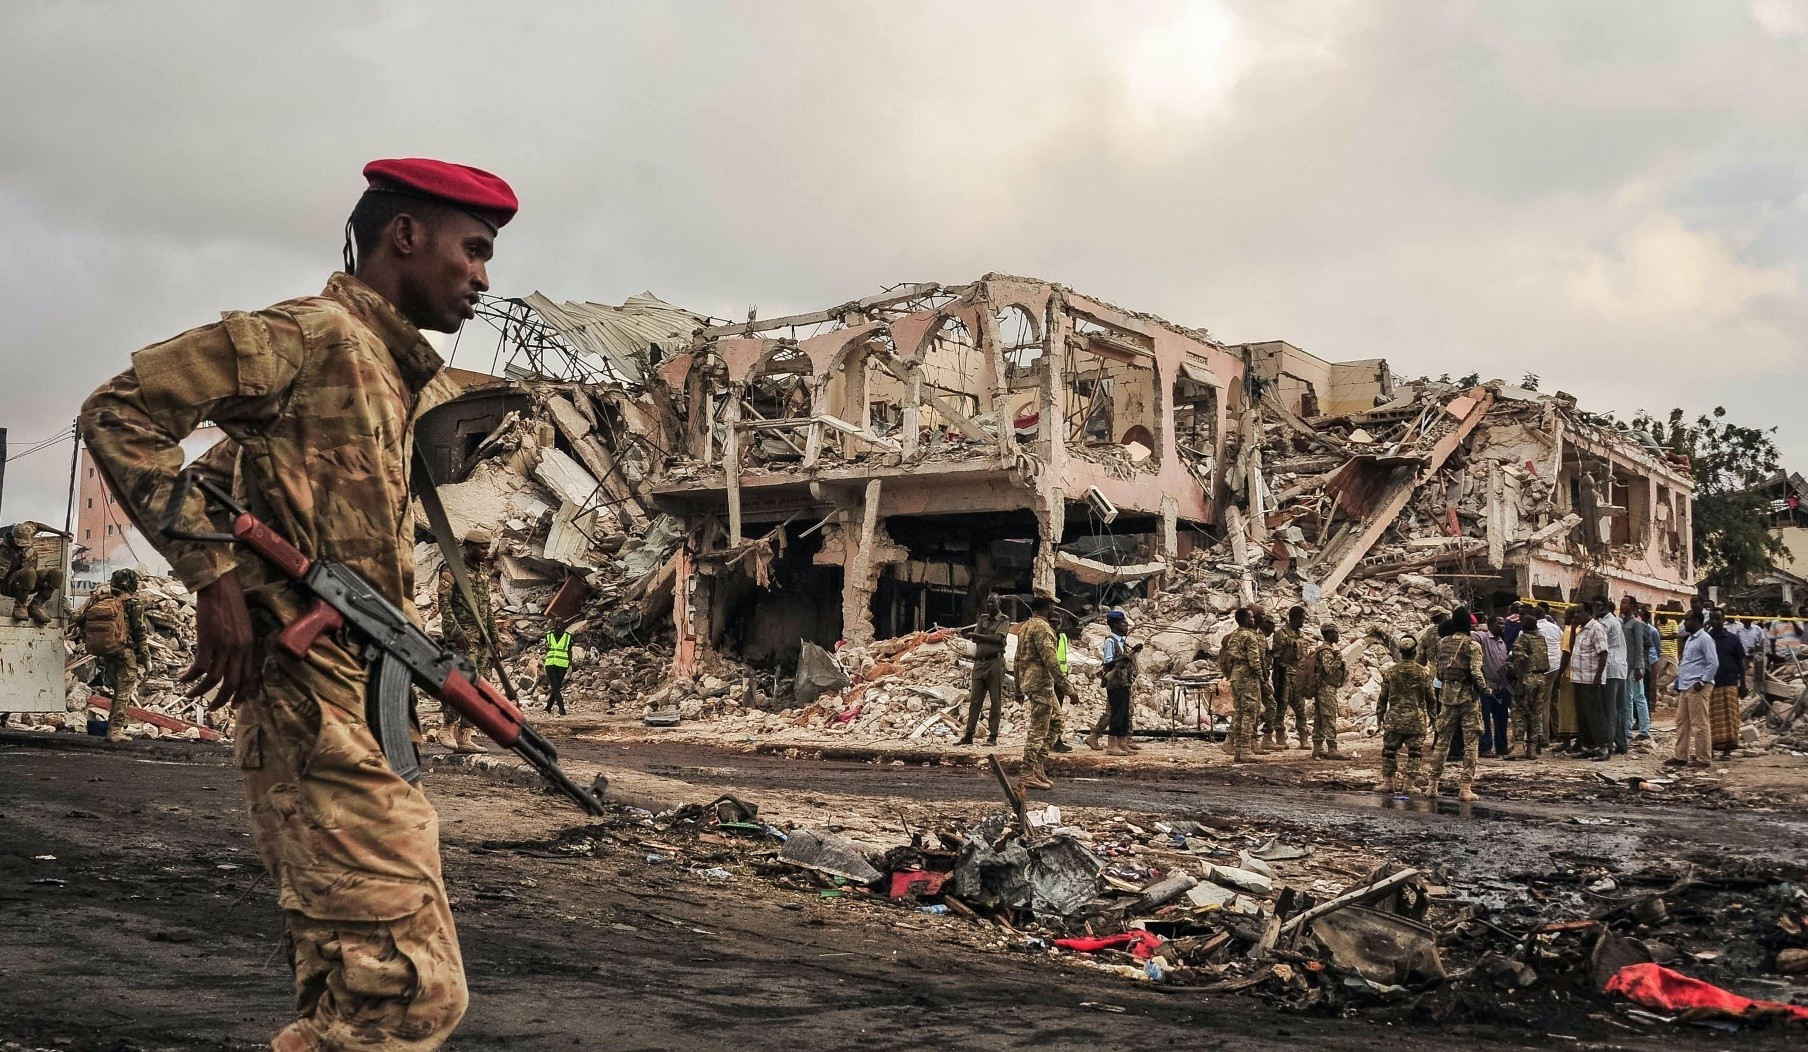 Somali soldiers patrol on the scene of a truck bomb explosu0131on in Mogadishu on October 15, 2017.